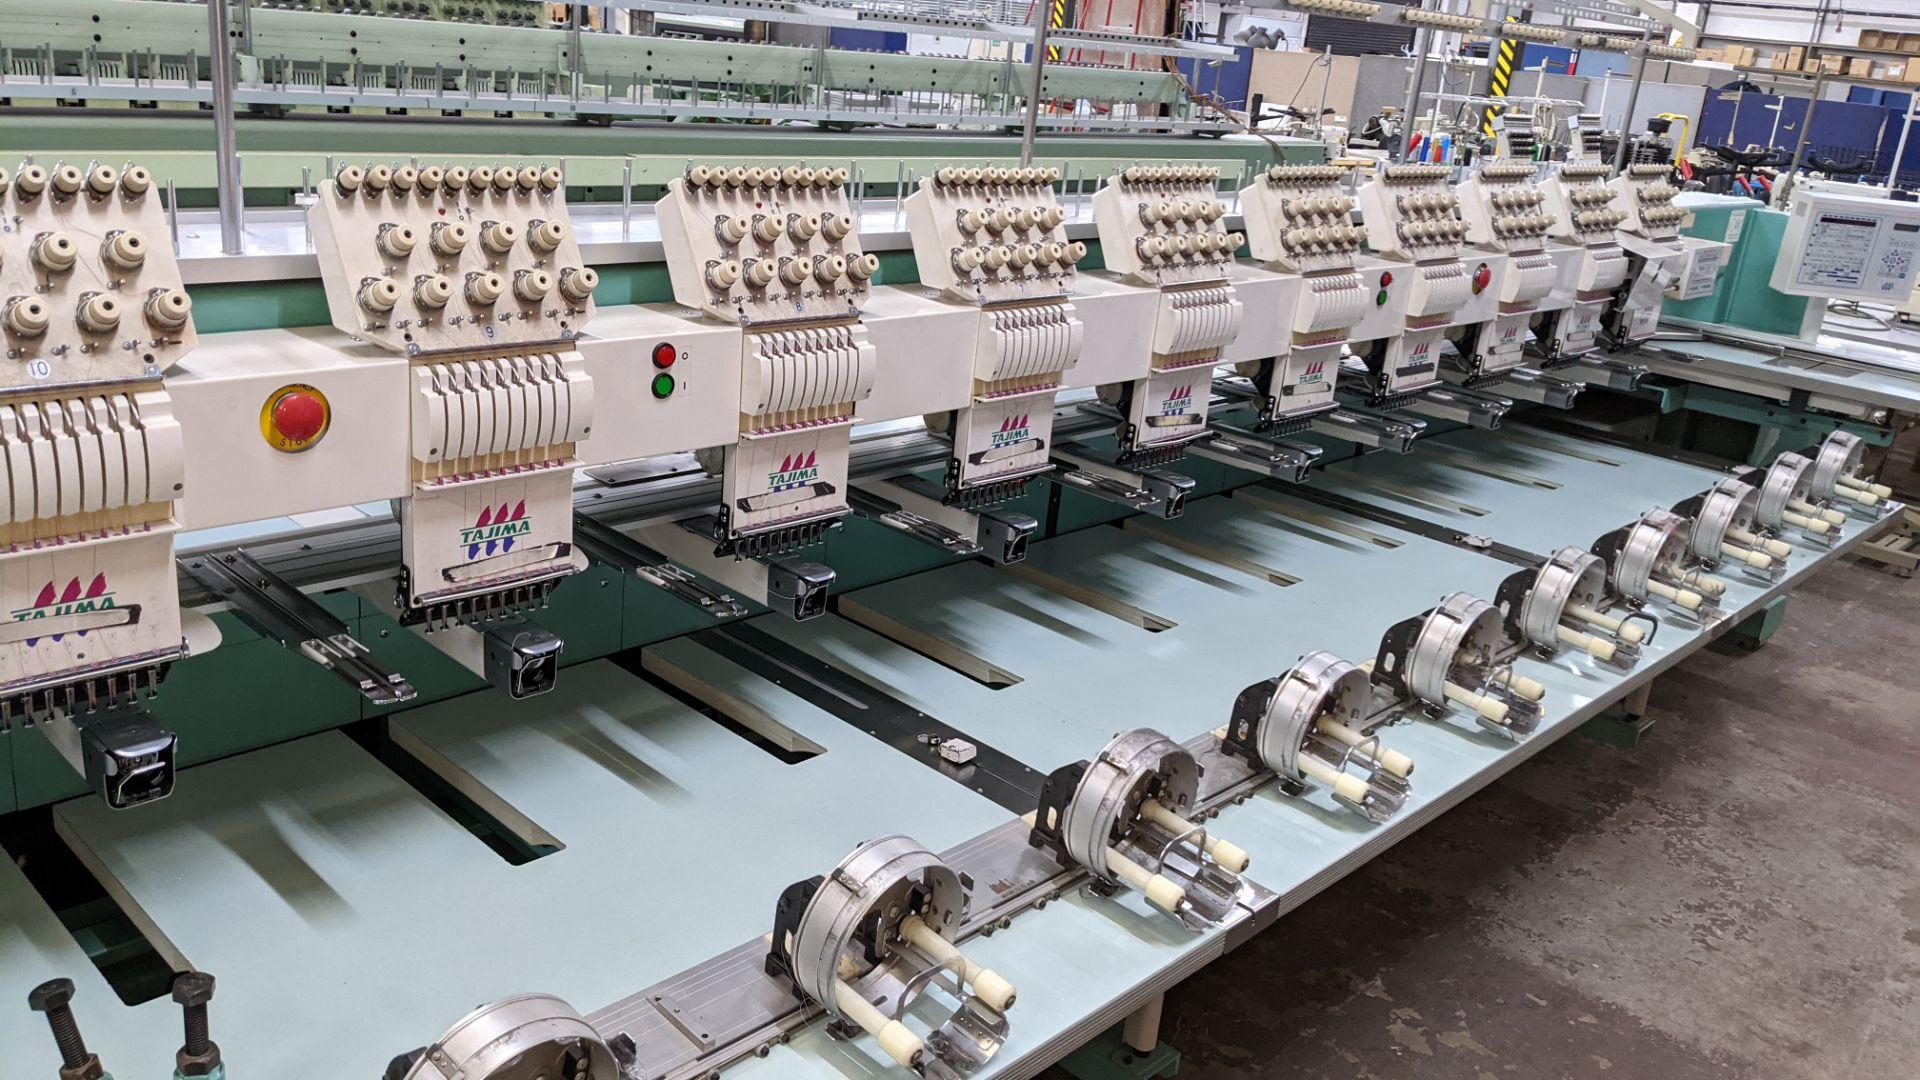 Tokai Tajima model TMFD-C912 electronic 12 head embroidery machine, type 2-2FX - Image 5 of 27